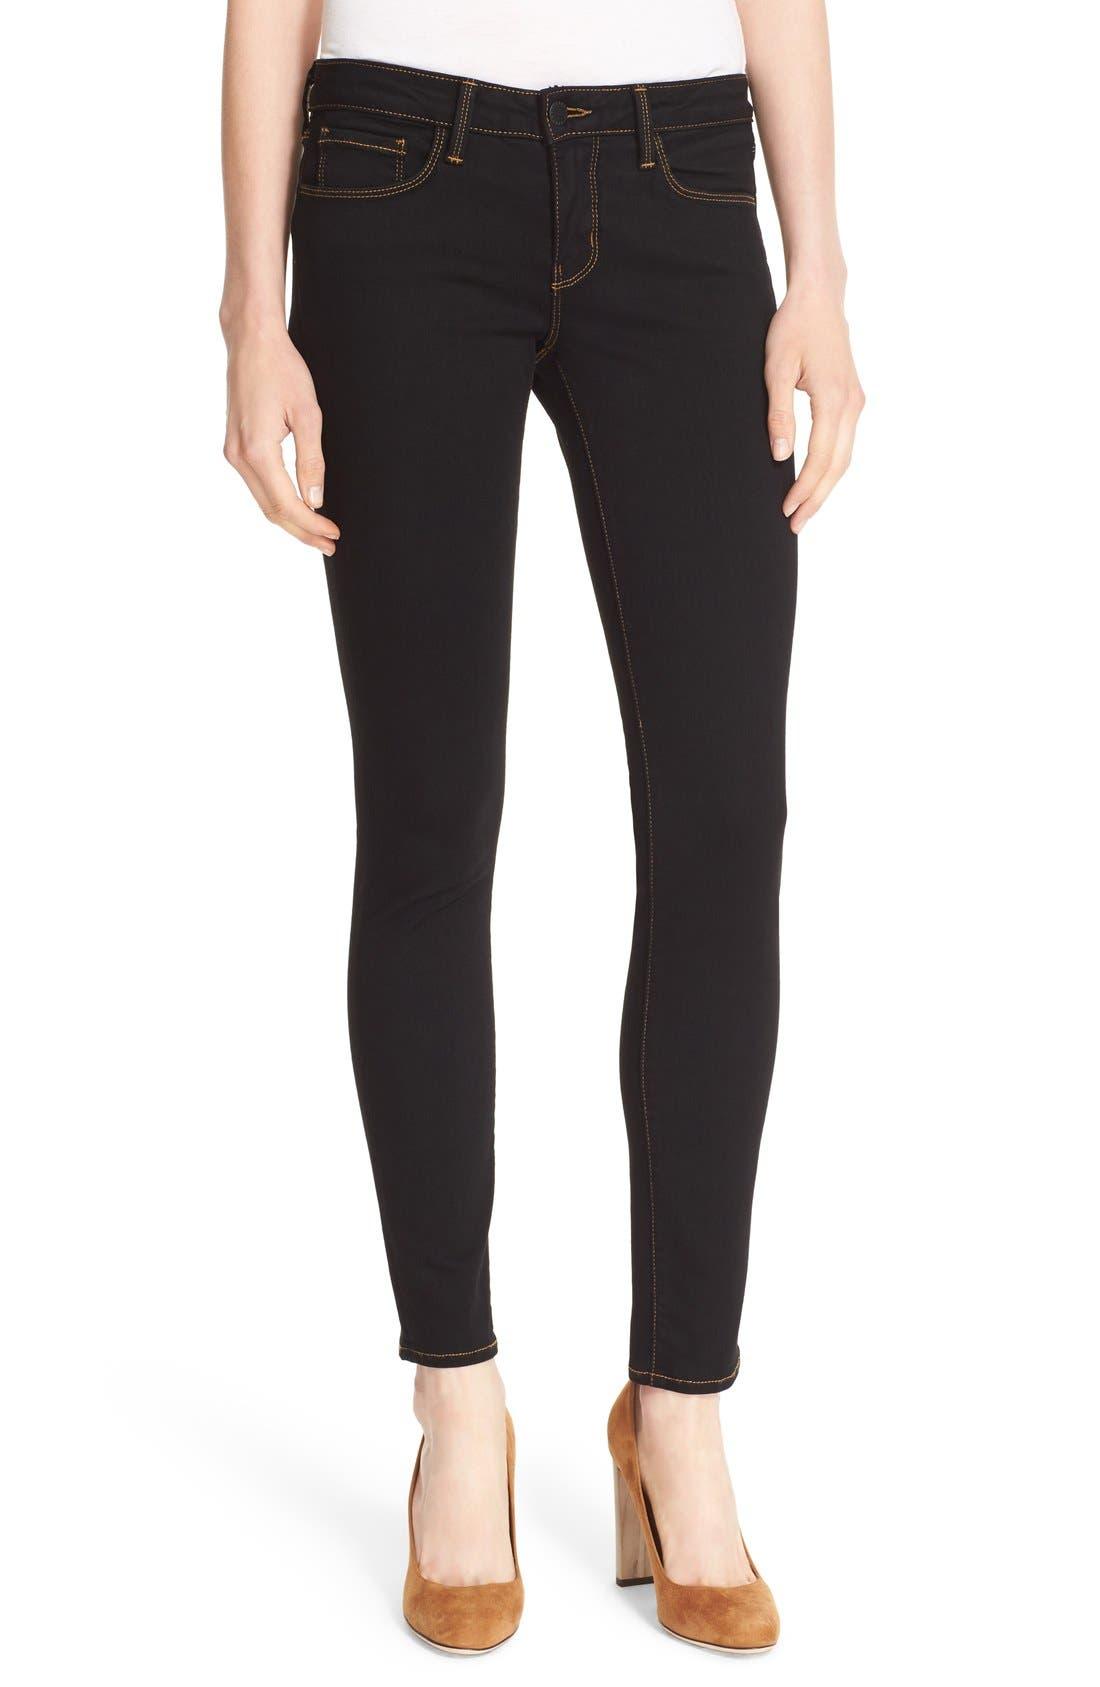 L'AGENCE 'Chantal' Skinny Jeans, Main, color, 001